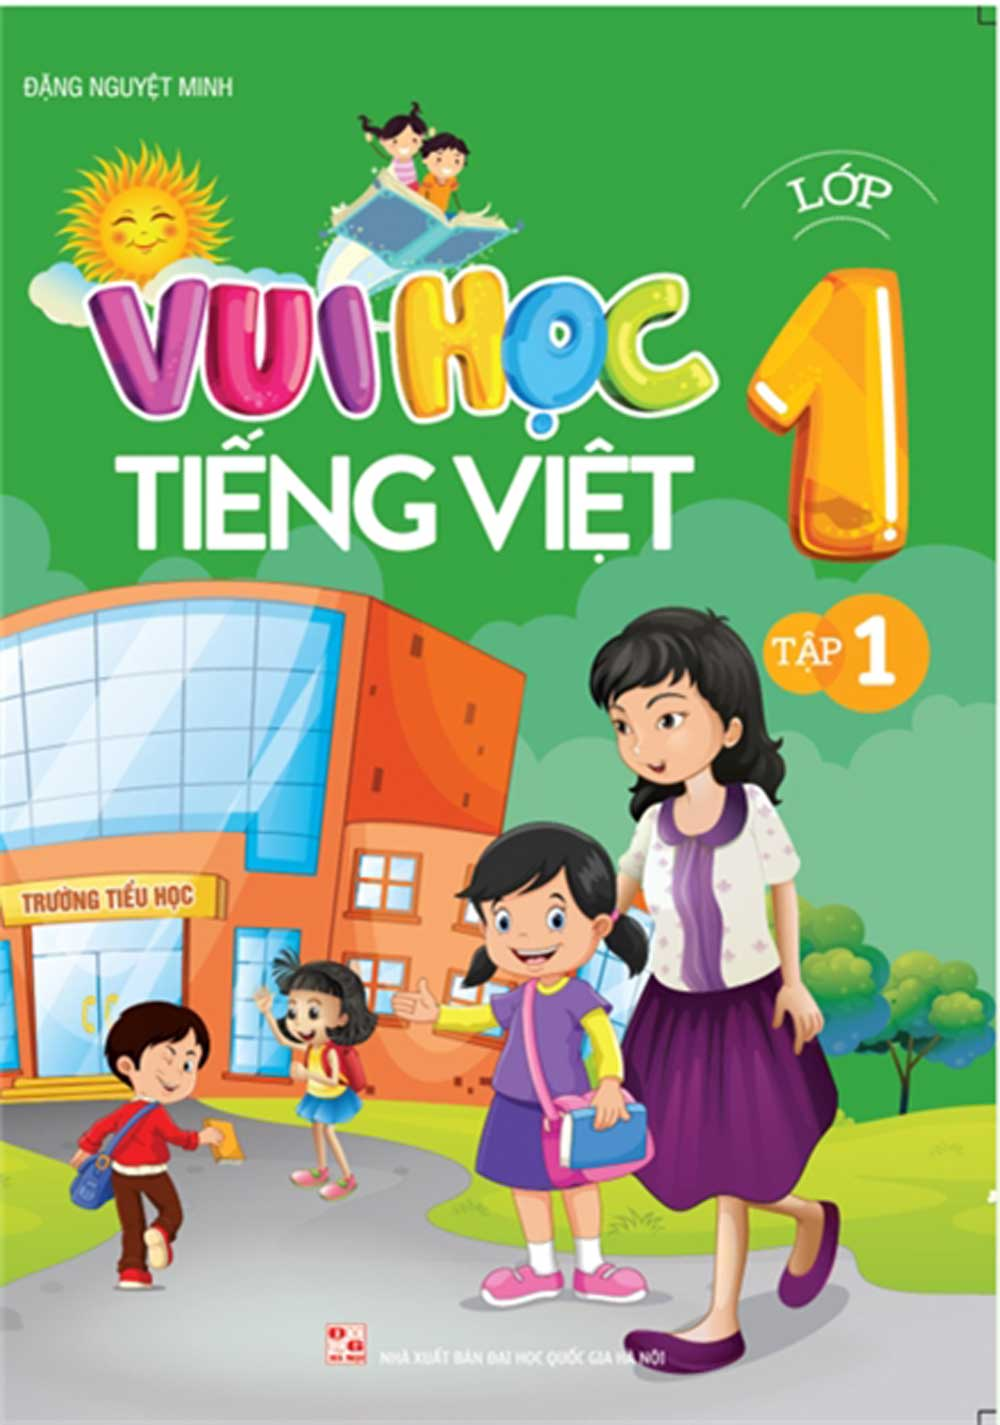 Vui Học Tiếng Việt Lớp 1 Tập 1 - EBOOK/PDF/PRC/EPUB